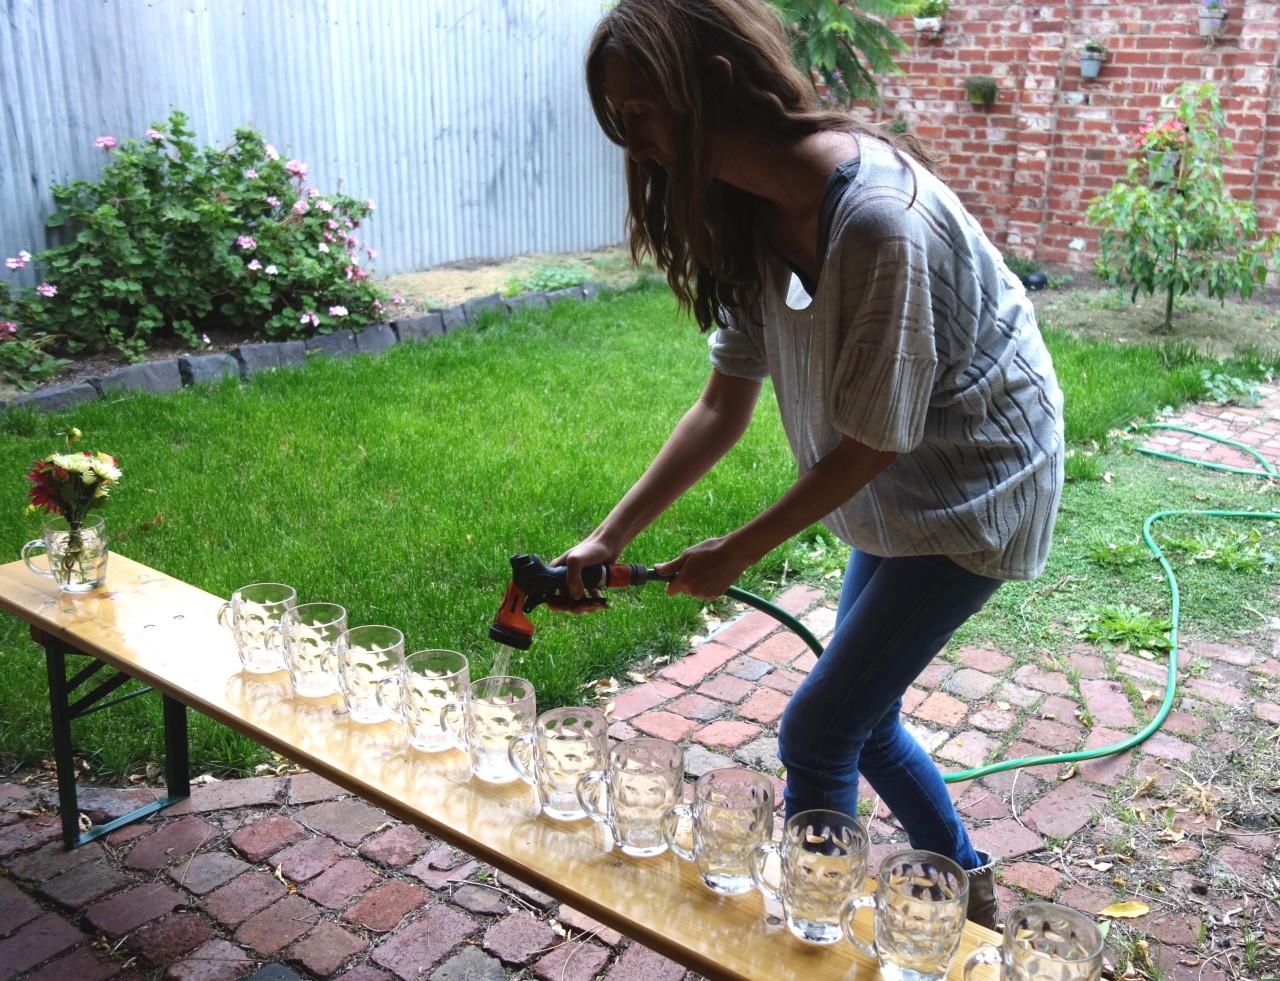 Filling vases for posies